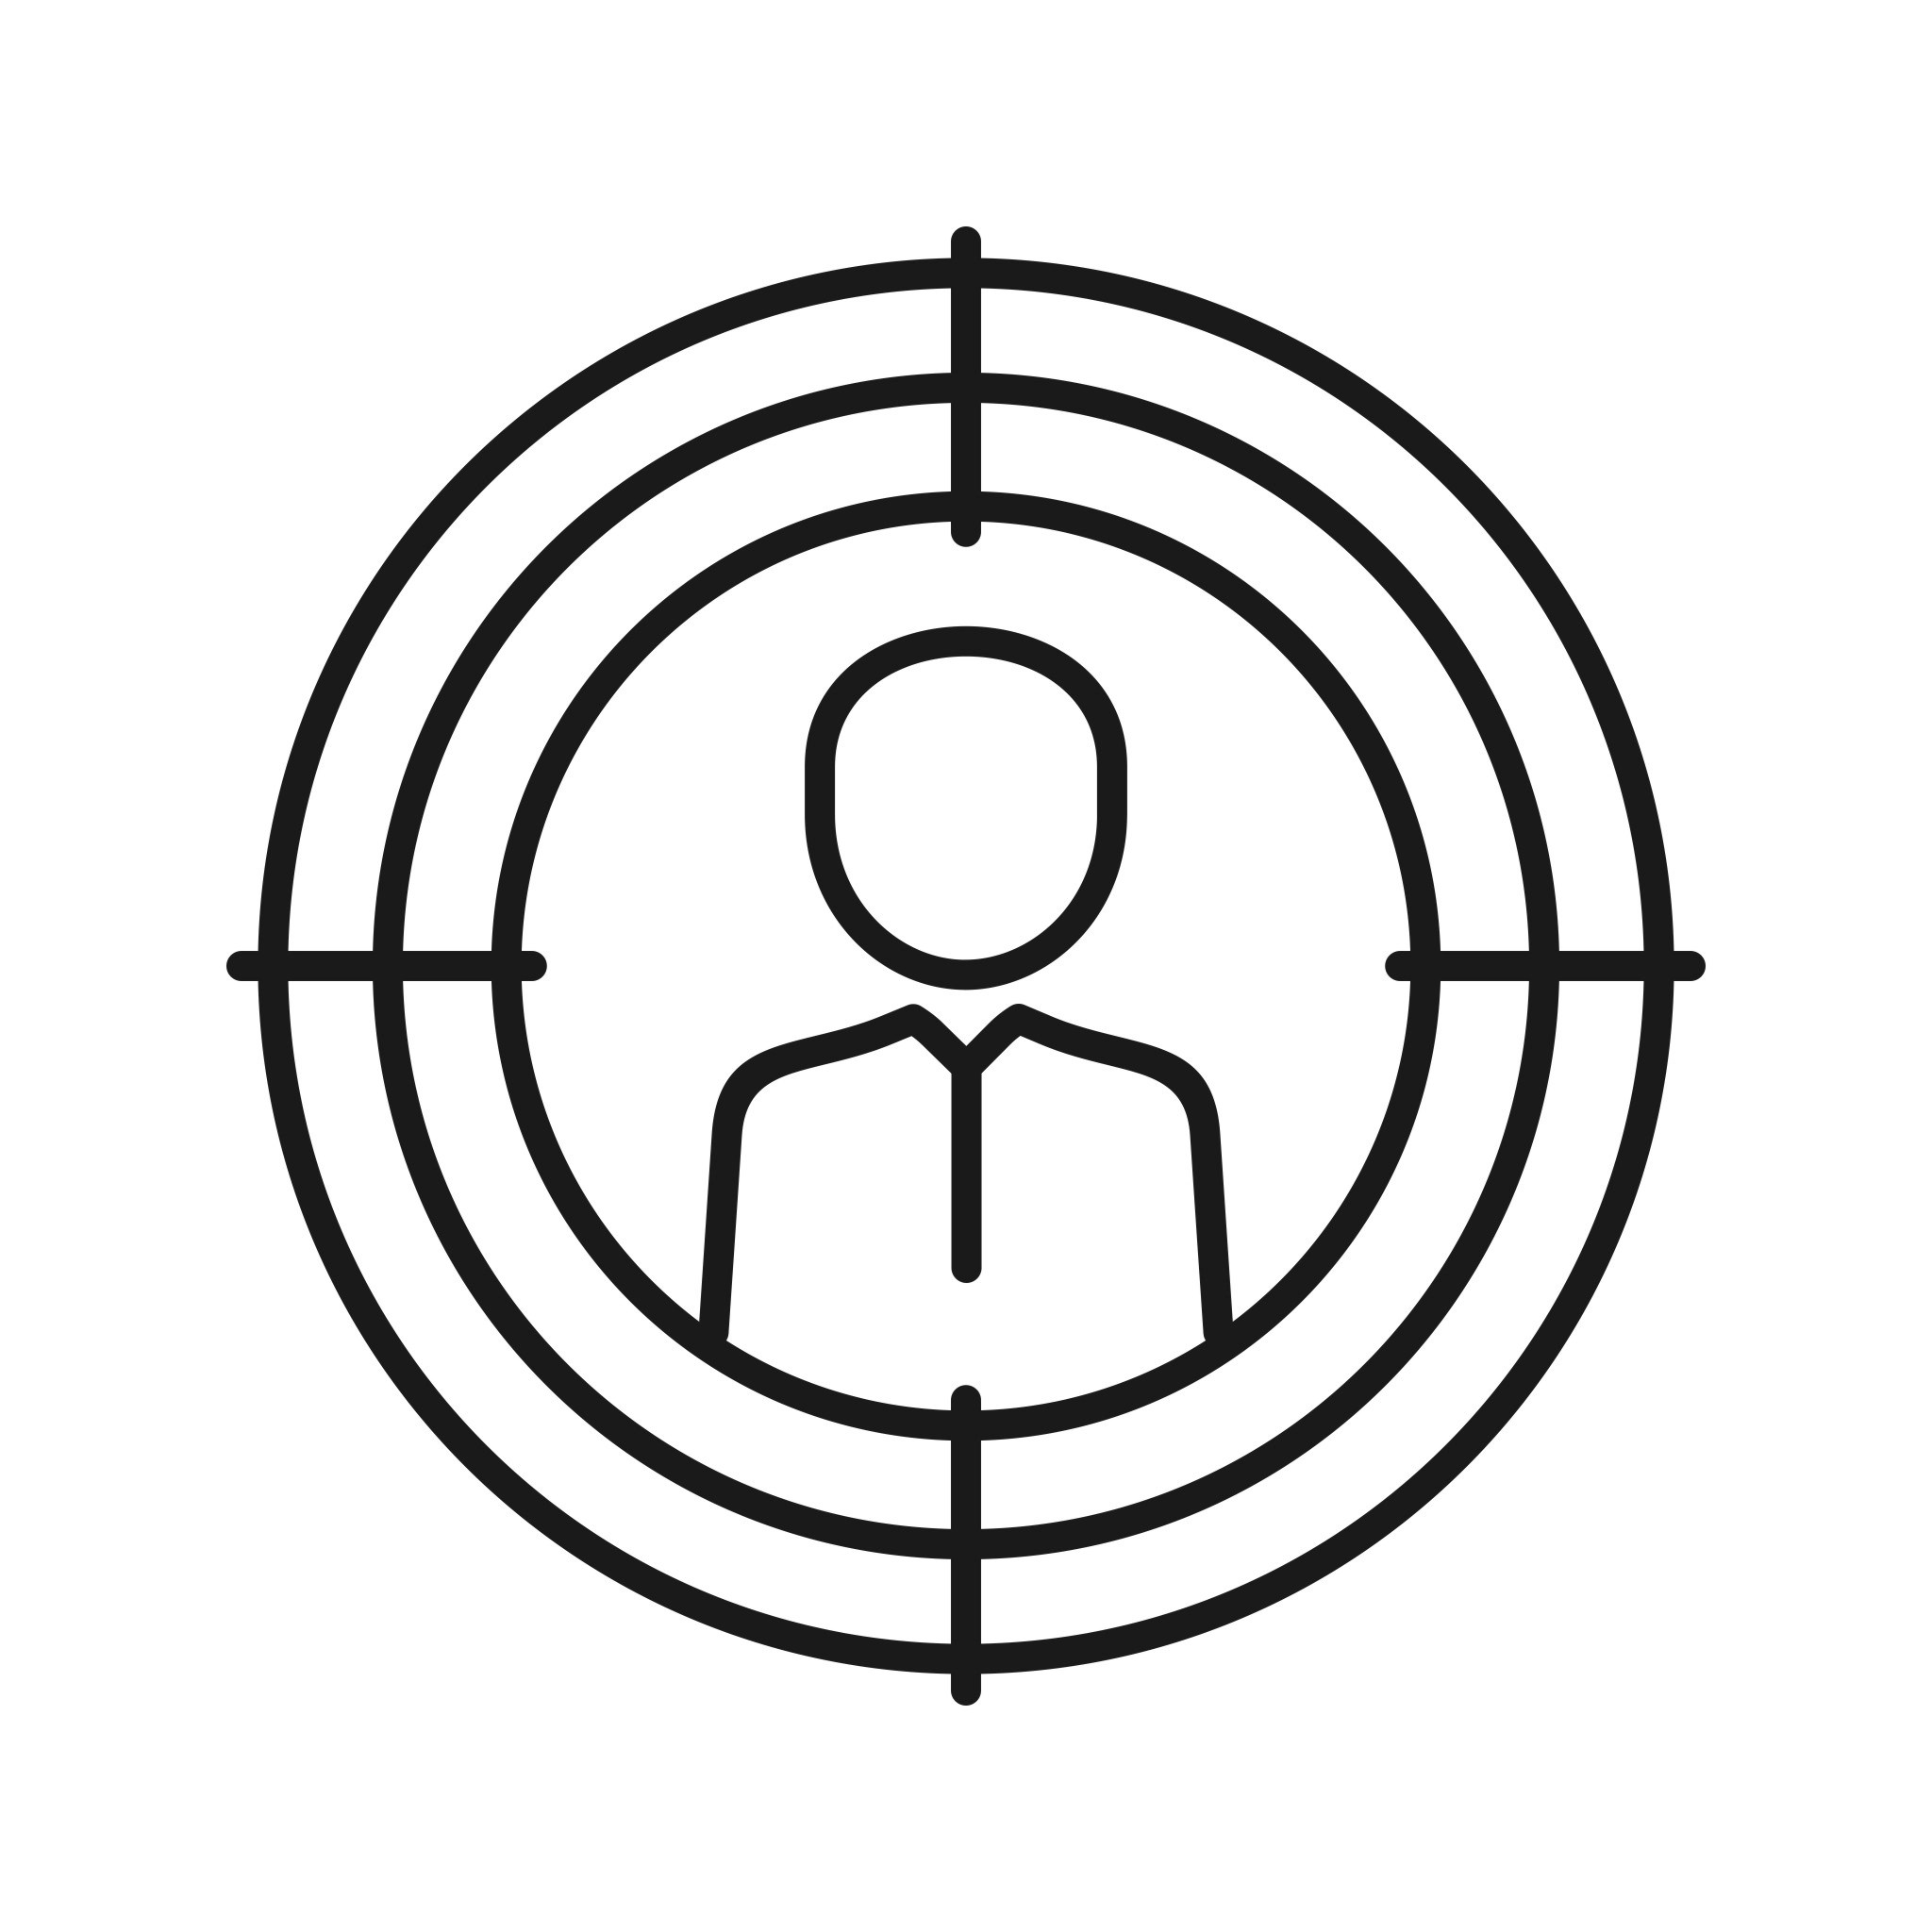 Target Marketing Seo Line Icon